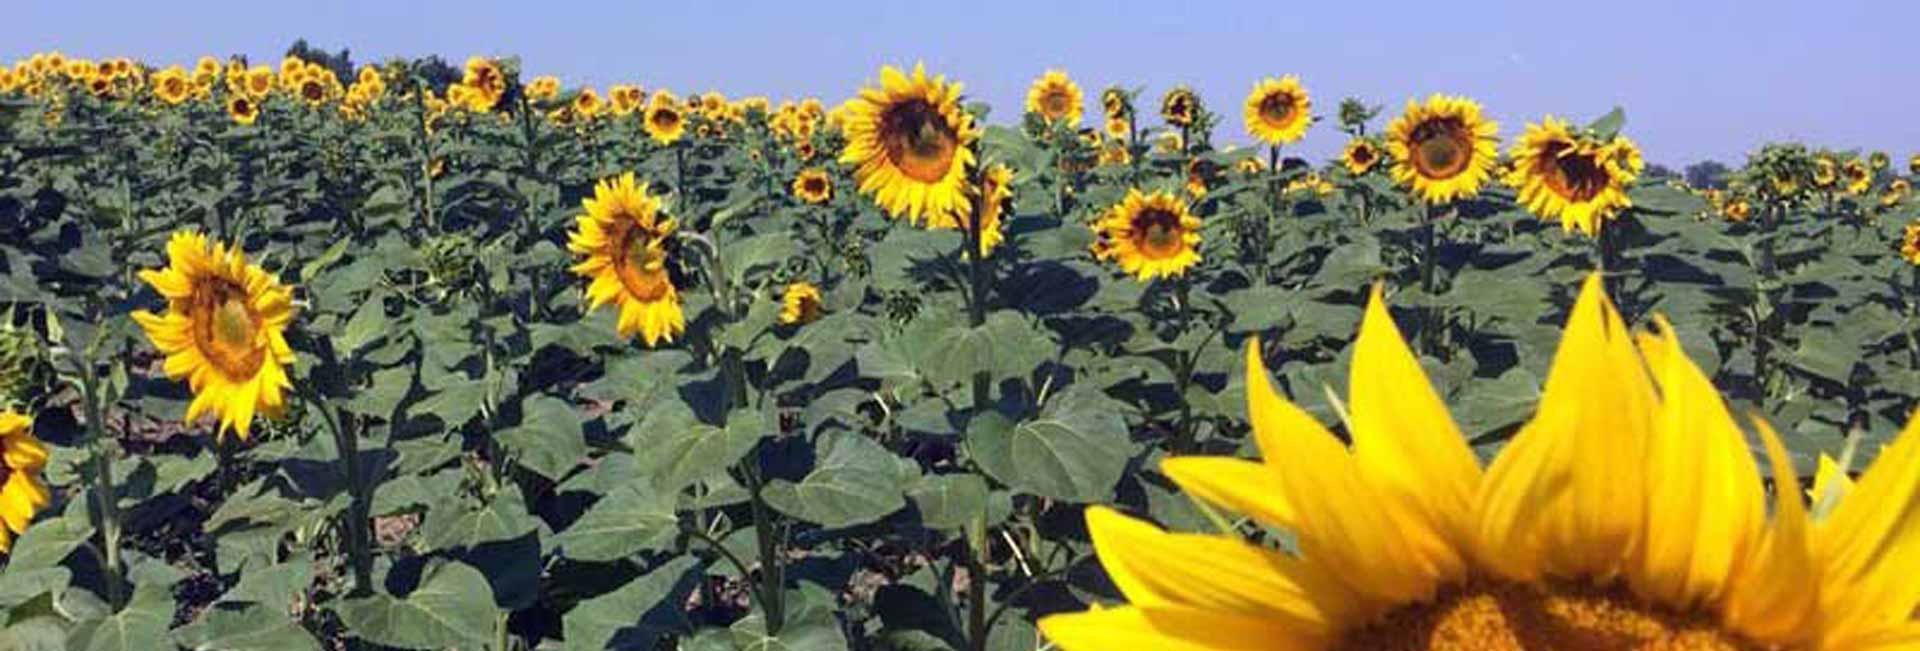 Sunflowers turn their faces toward the sun. Photo credit: Luba Rudenko